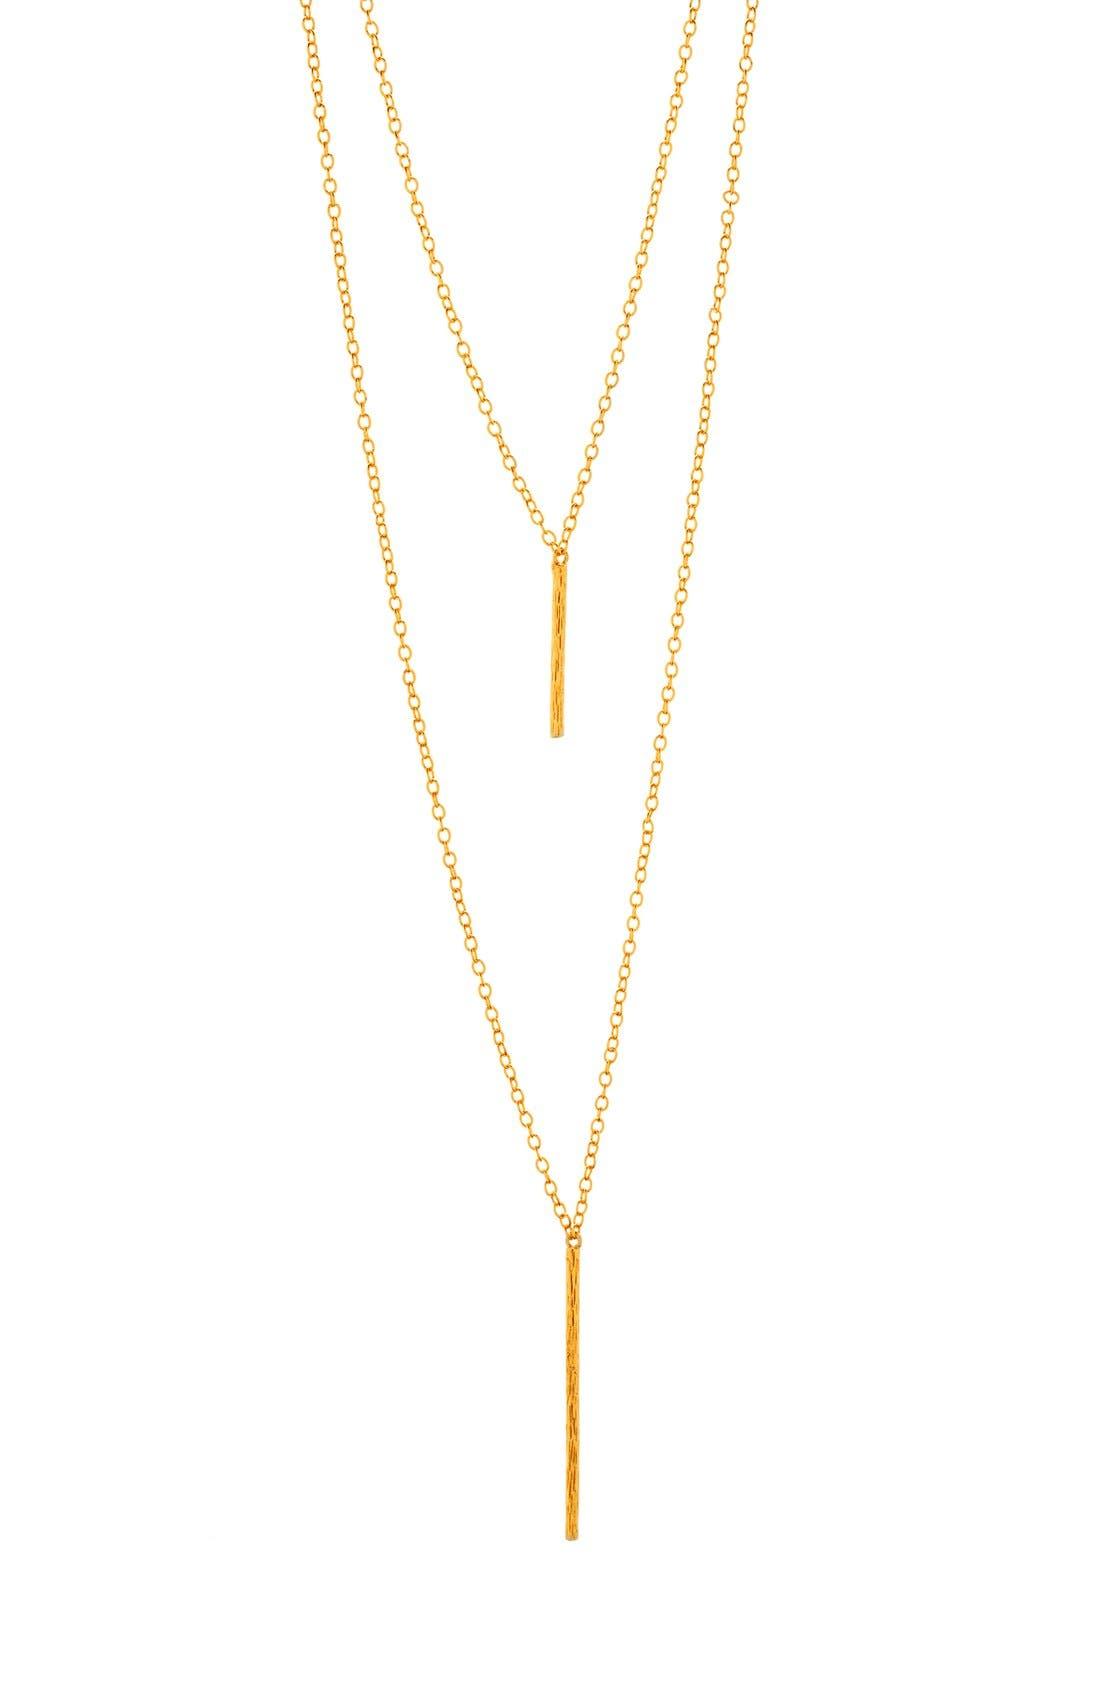 Alternate Image 1 Selected - gorjana 'Kiernan' Layered Pendant Necklace